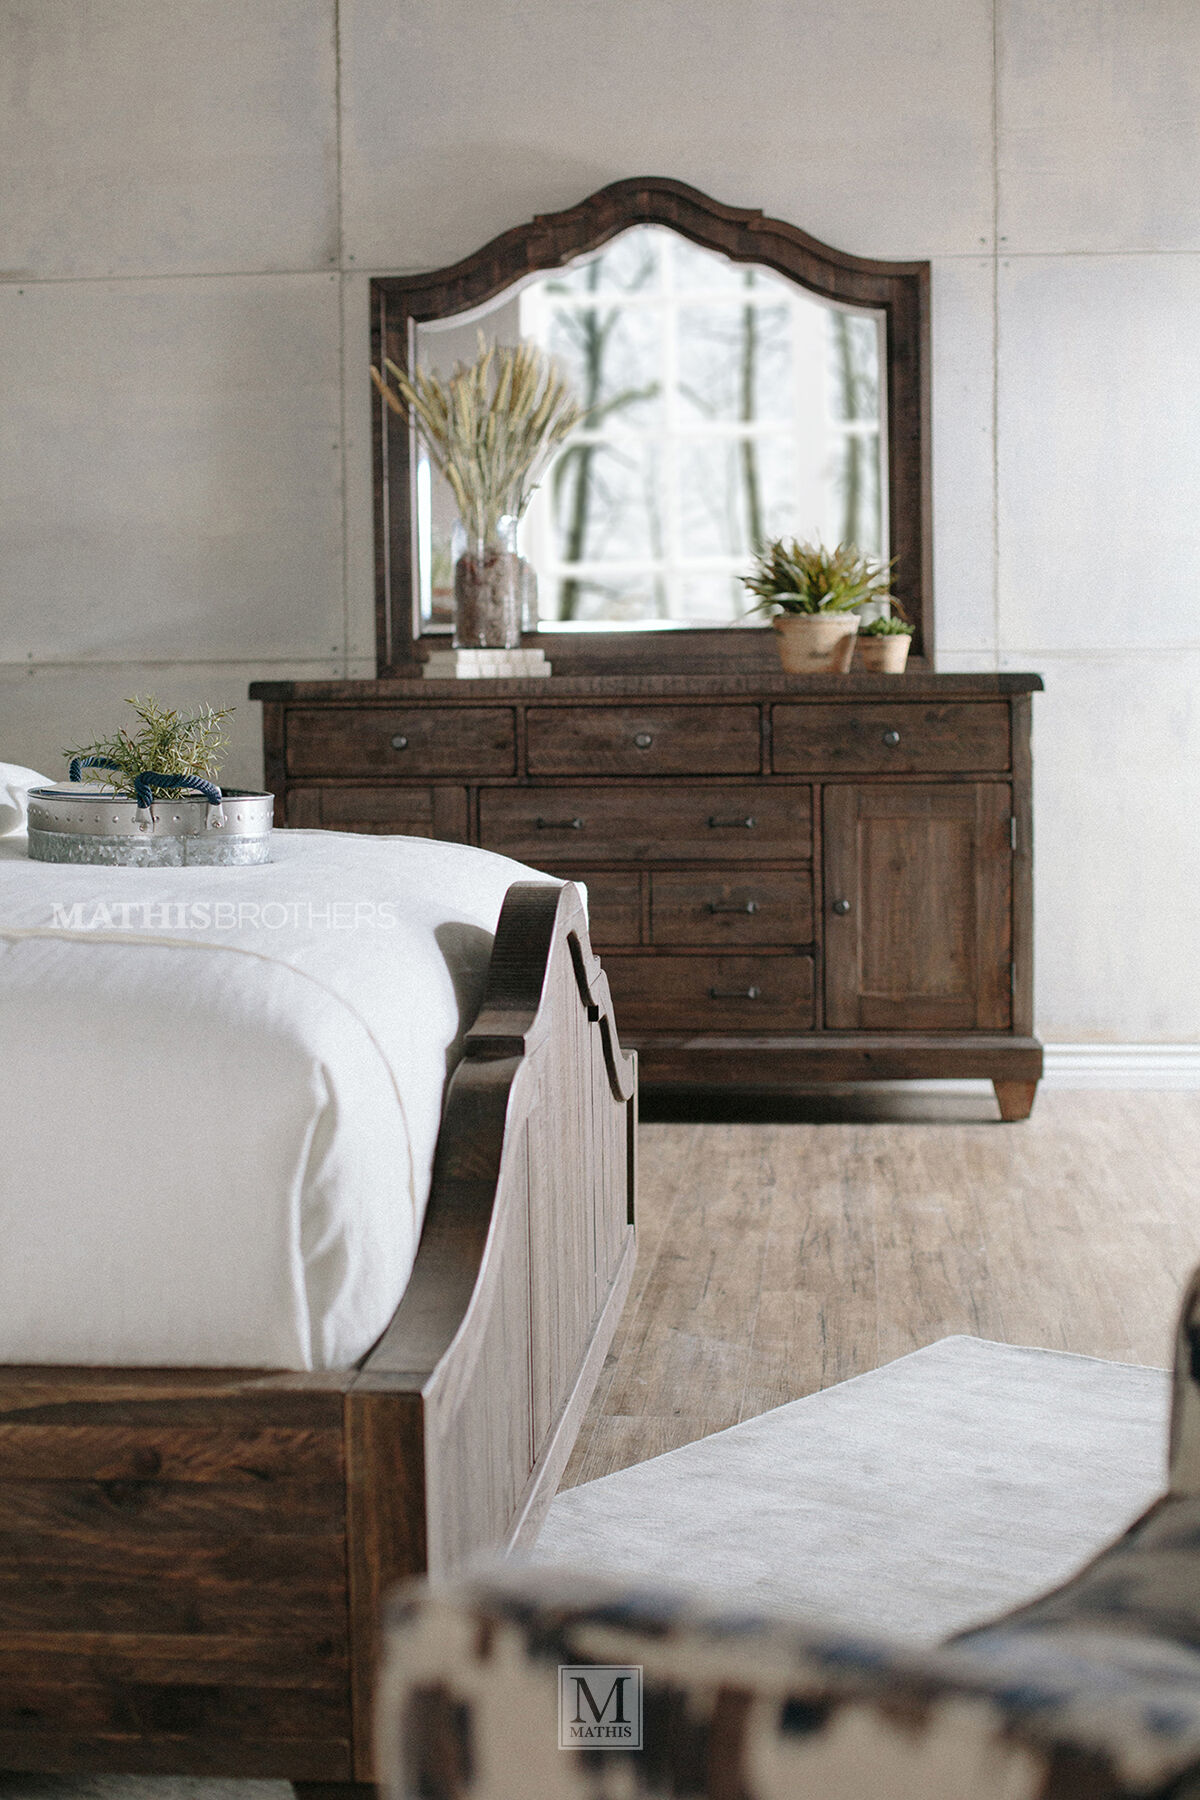 magnussen home brenley suite - Magnussen Furniture